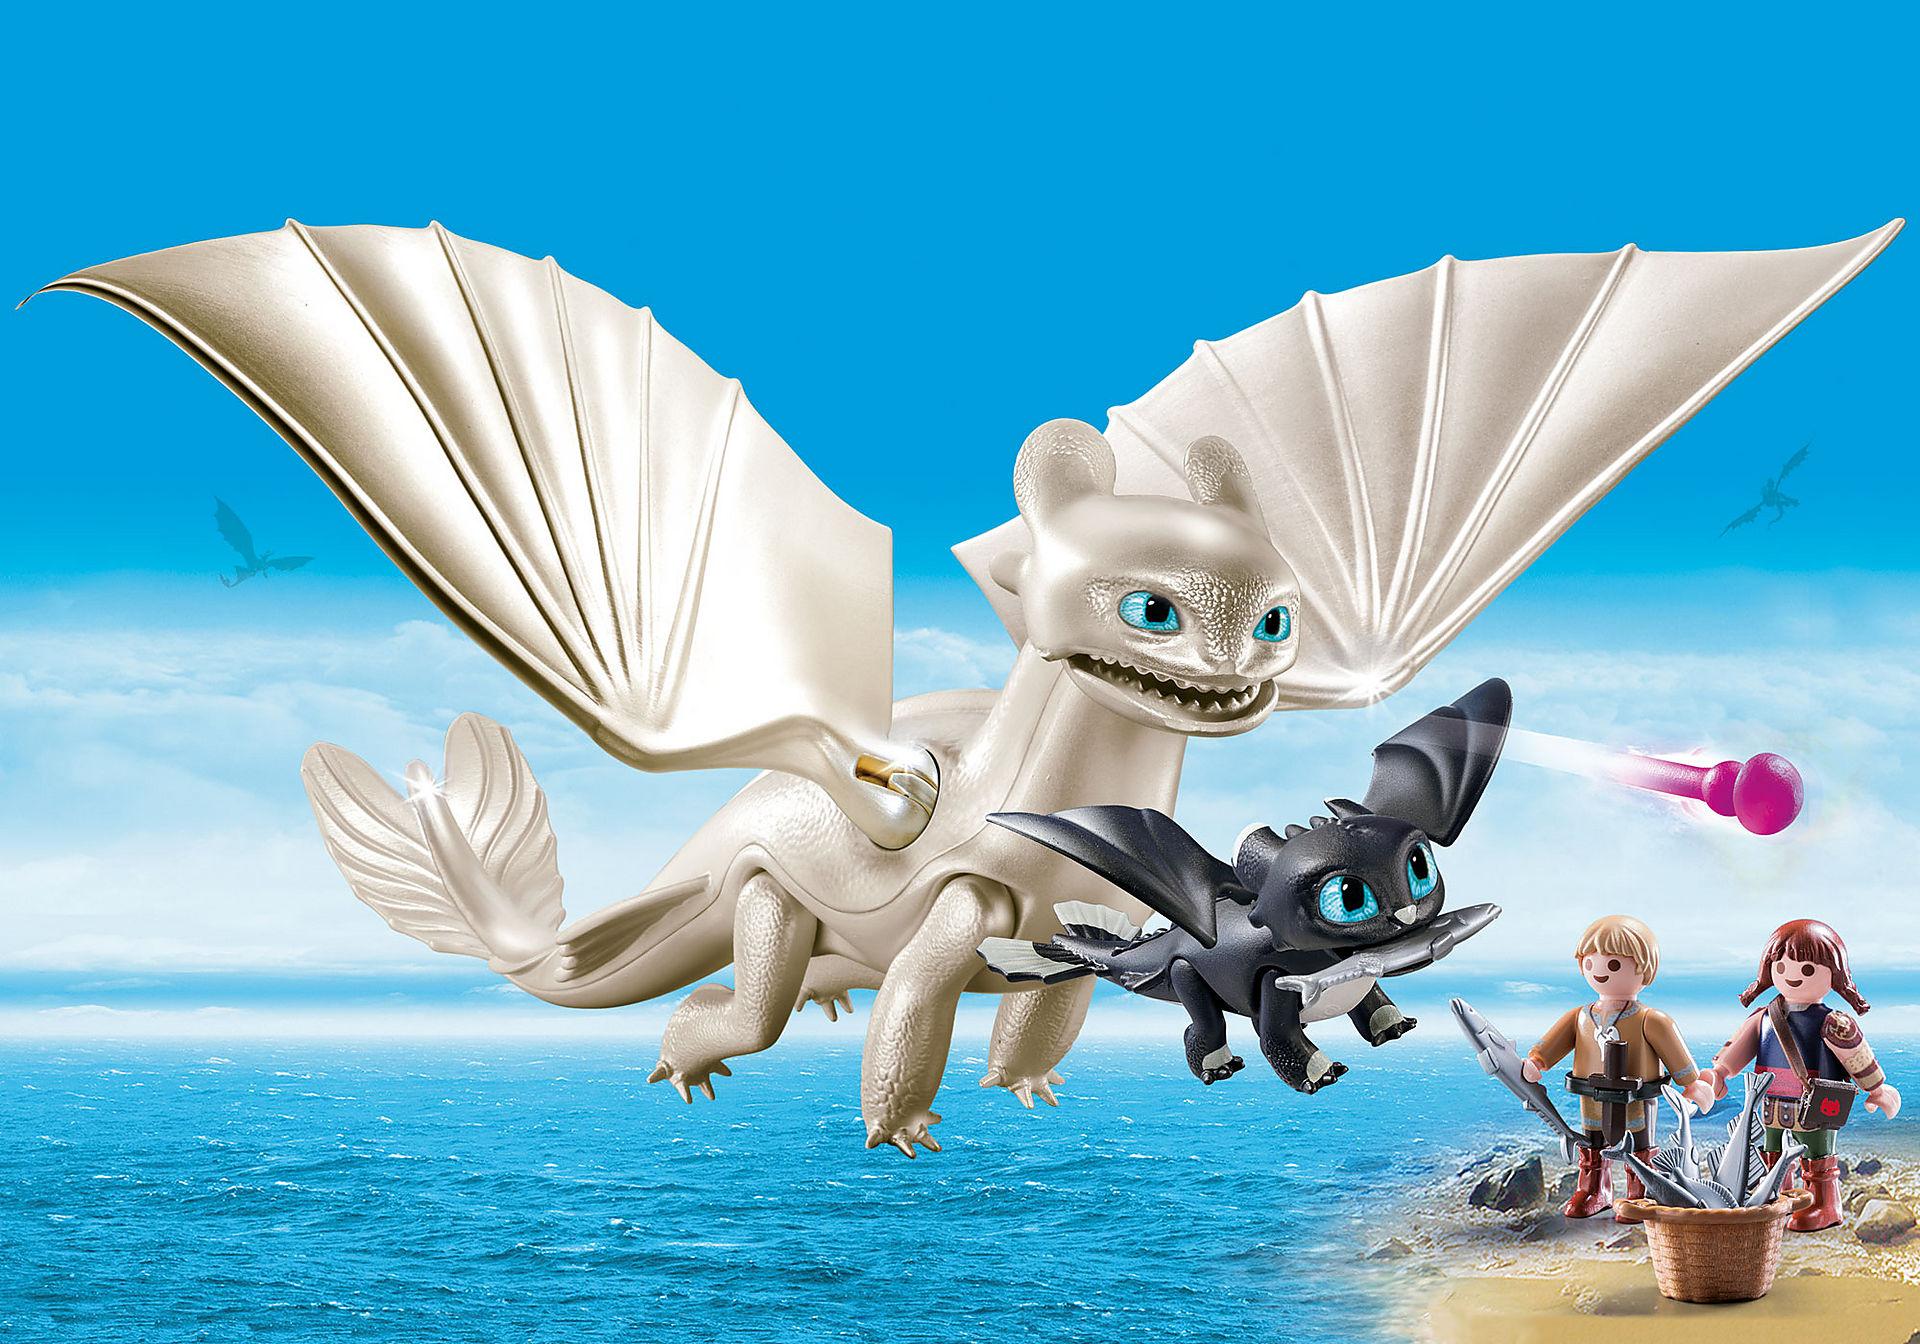 http://media.playmobil.com/i/playmobil/70038_product_detail/Tagschatten und Kinder mit Babydrachen